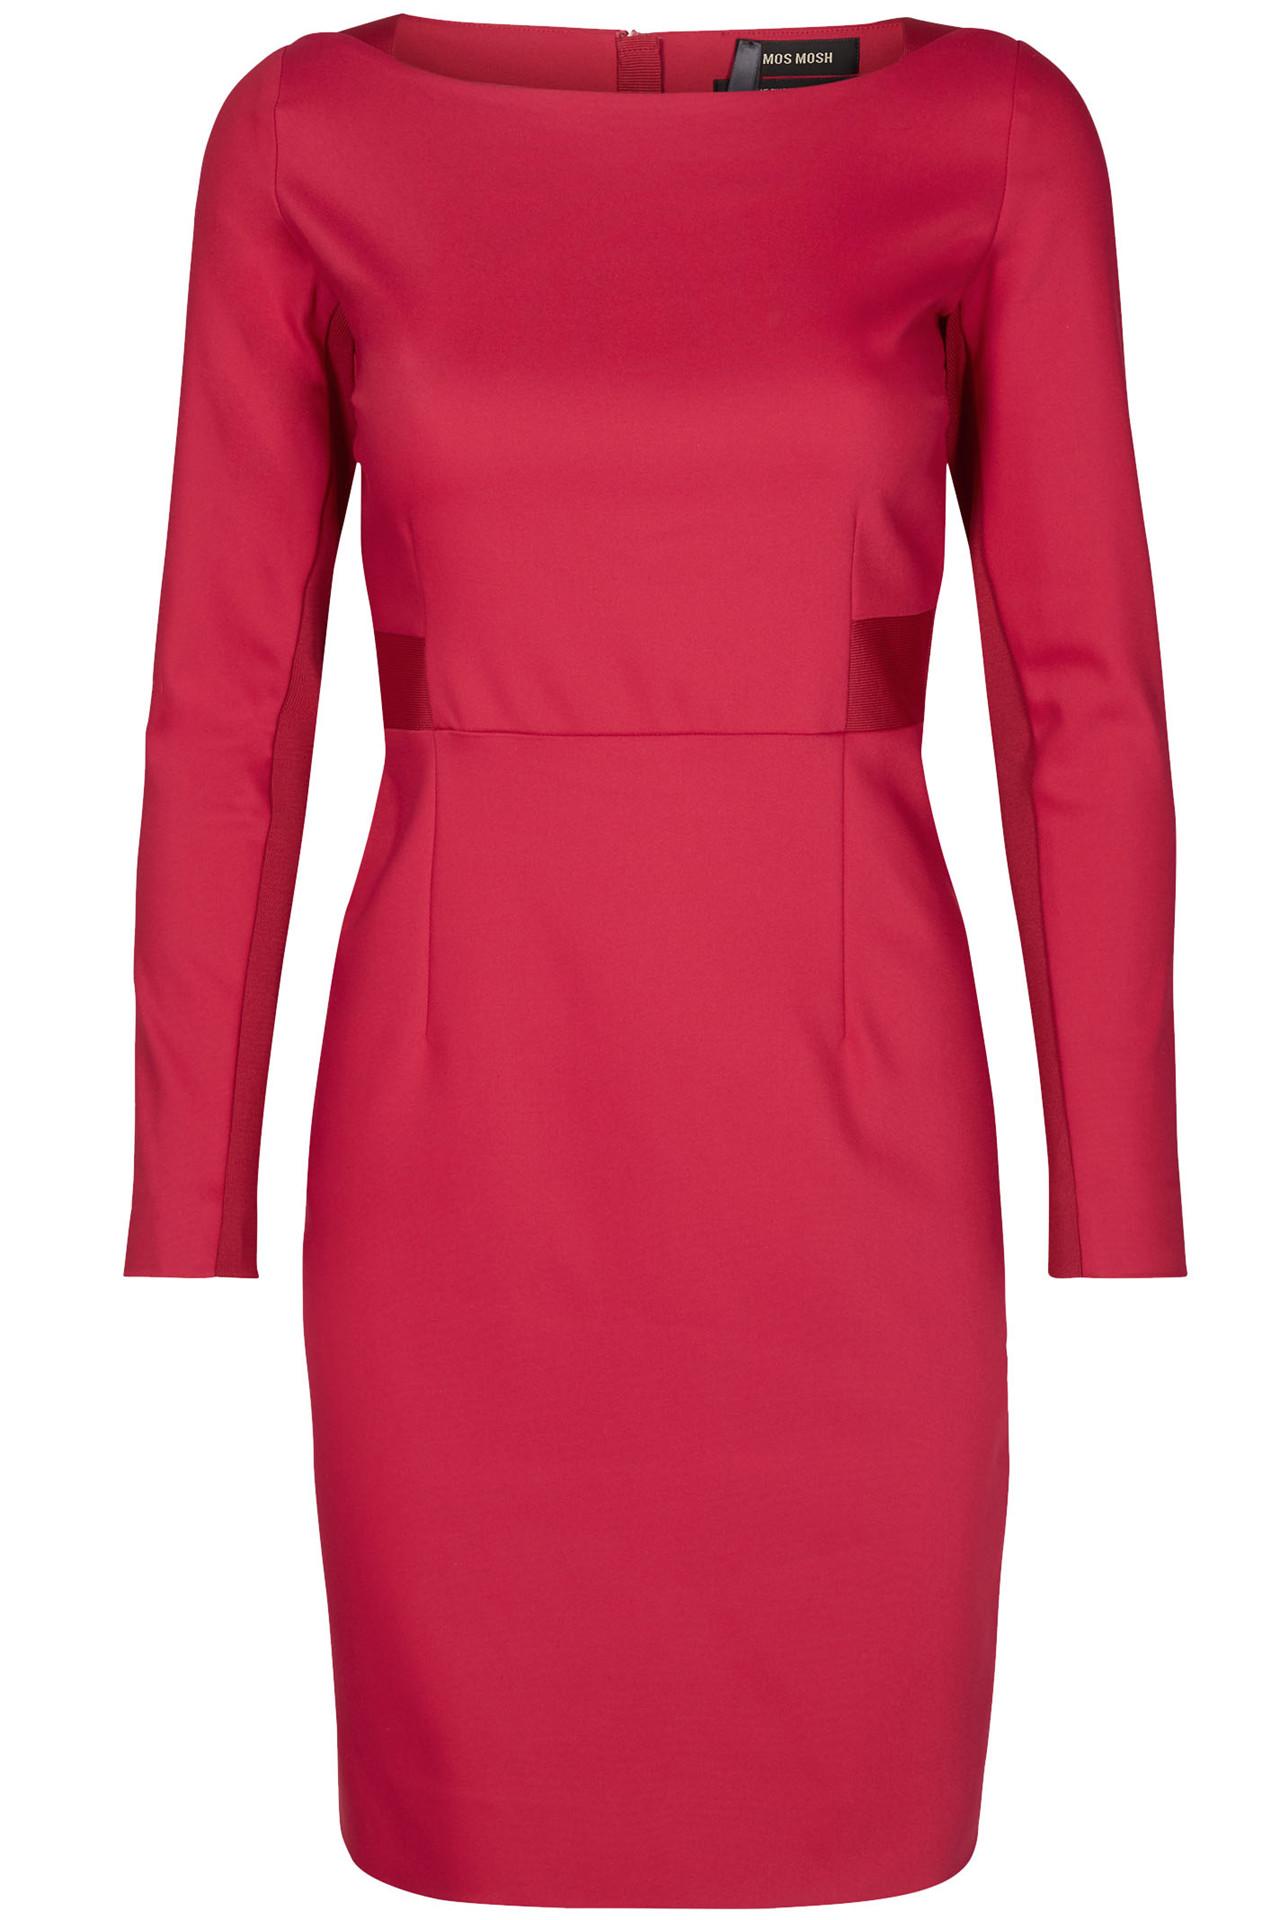 00d47695 BLAKE NIGHT DRESS 120590 cherry kjole fra Mos Mosh - Køb kjole ...